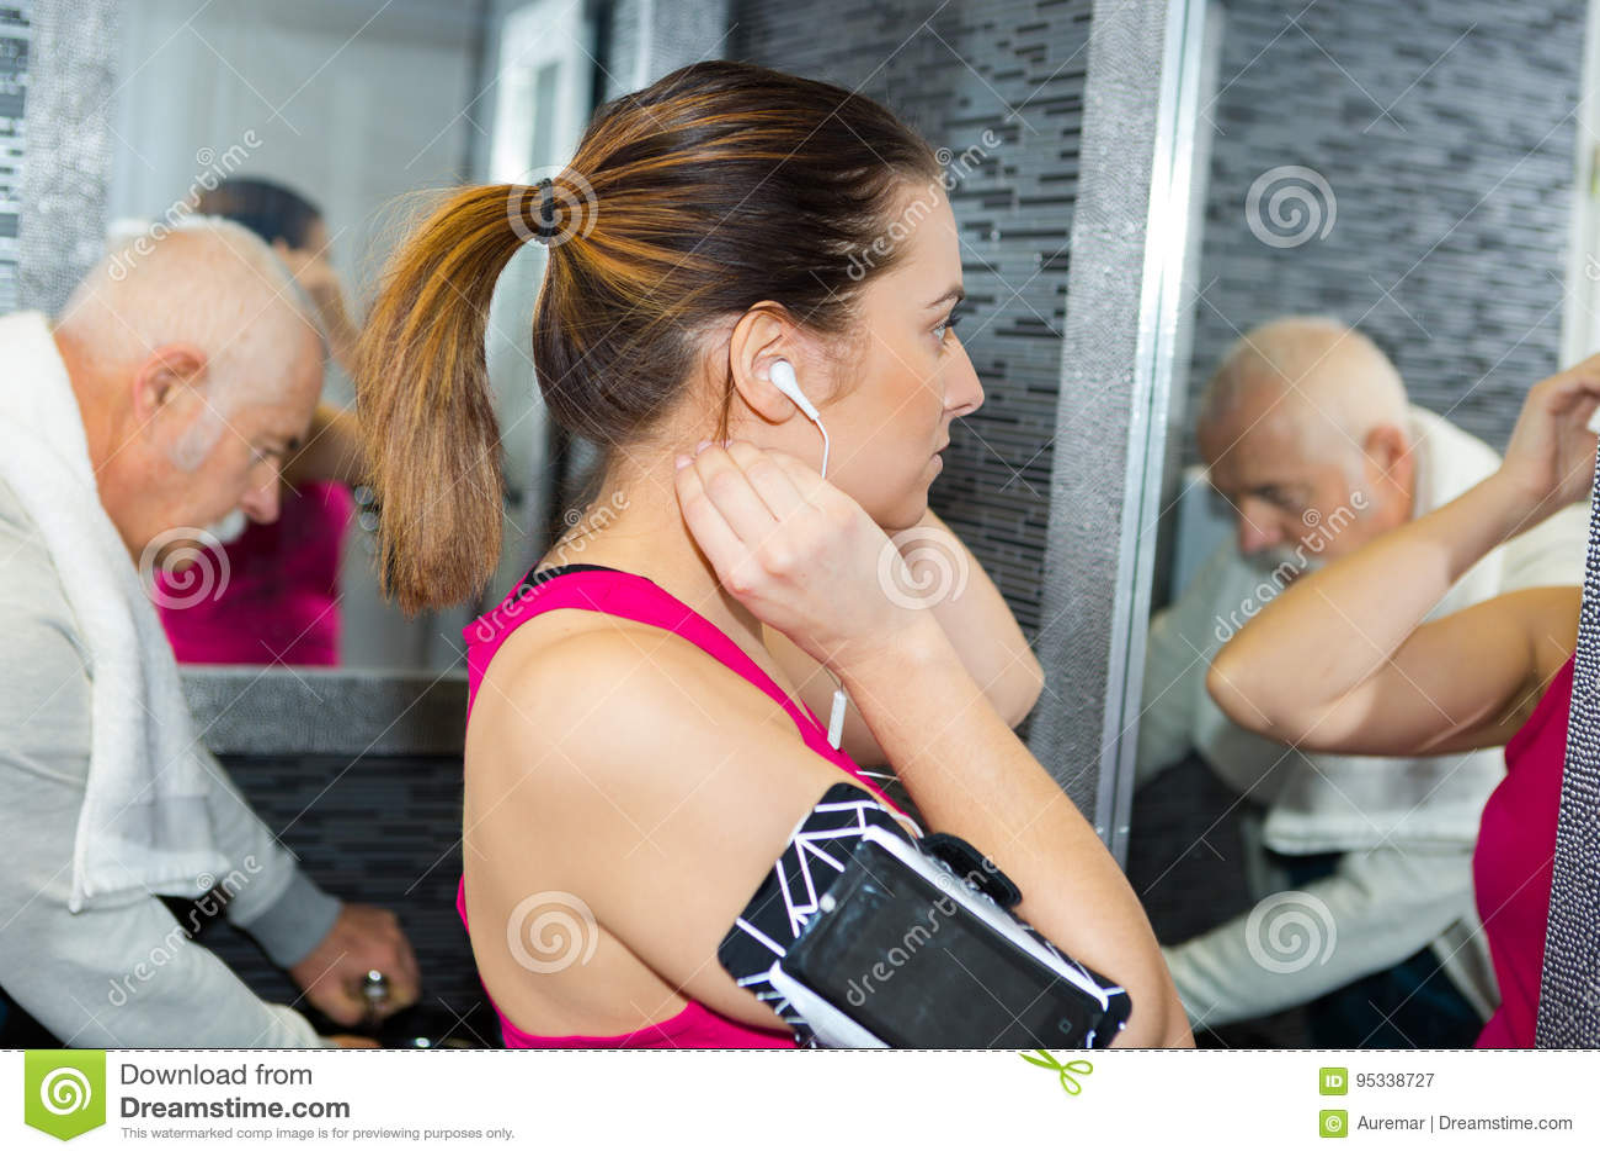 Na sala de lavagem dos gyms